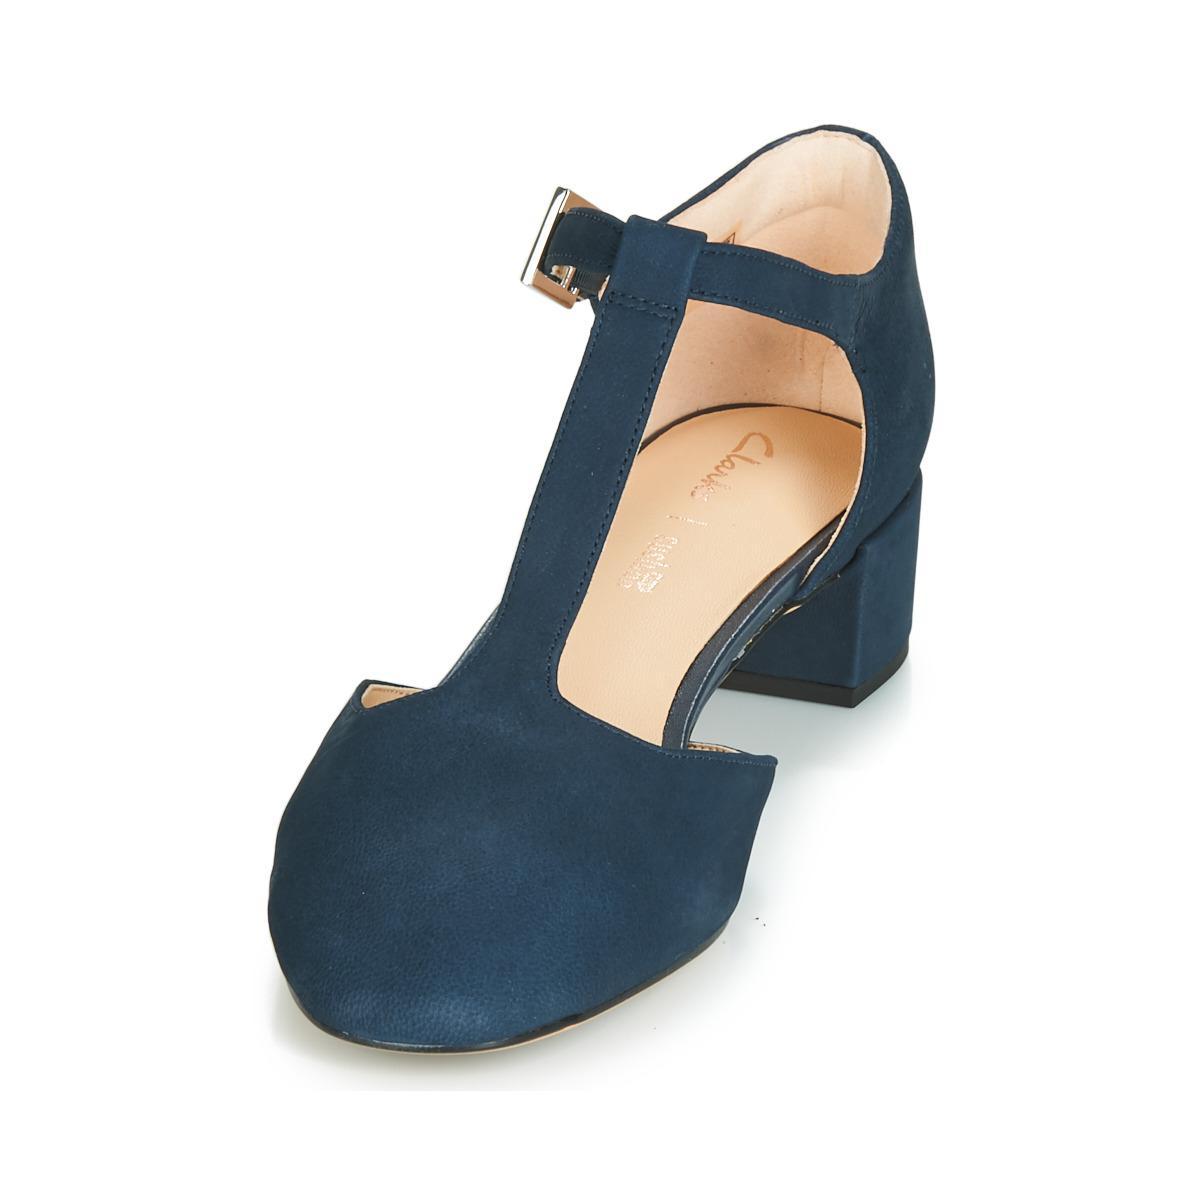 85024f3aa8b Clarks - Blue Orabella Holly Heels - Lyst. View fullscreen